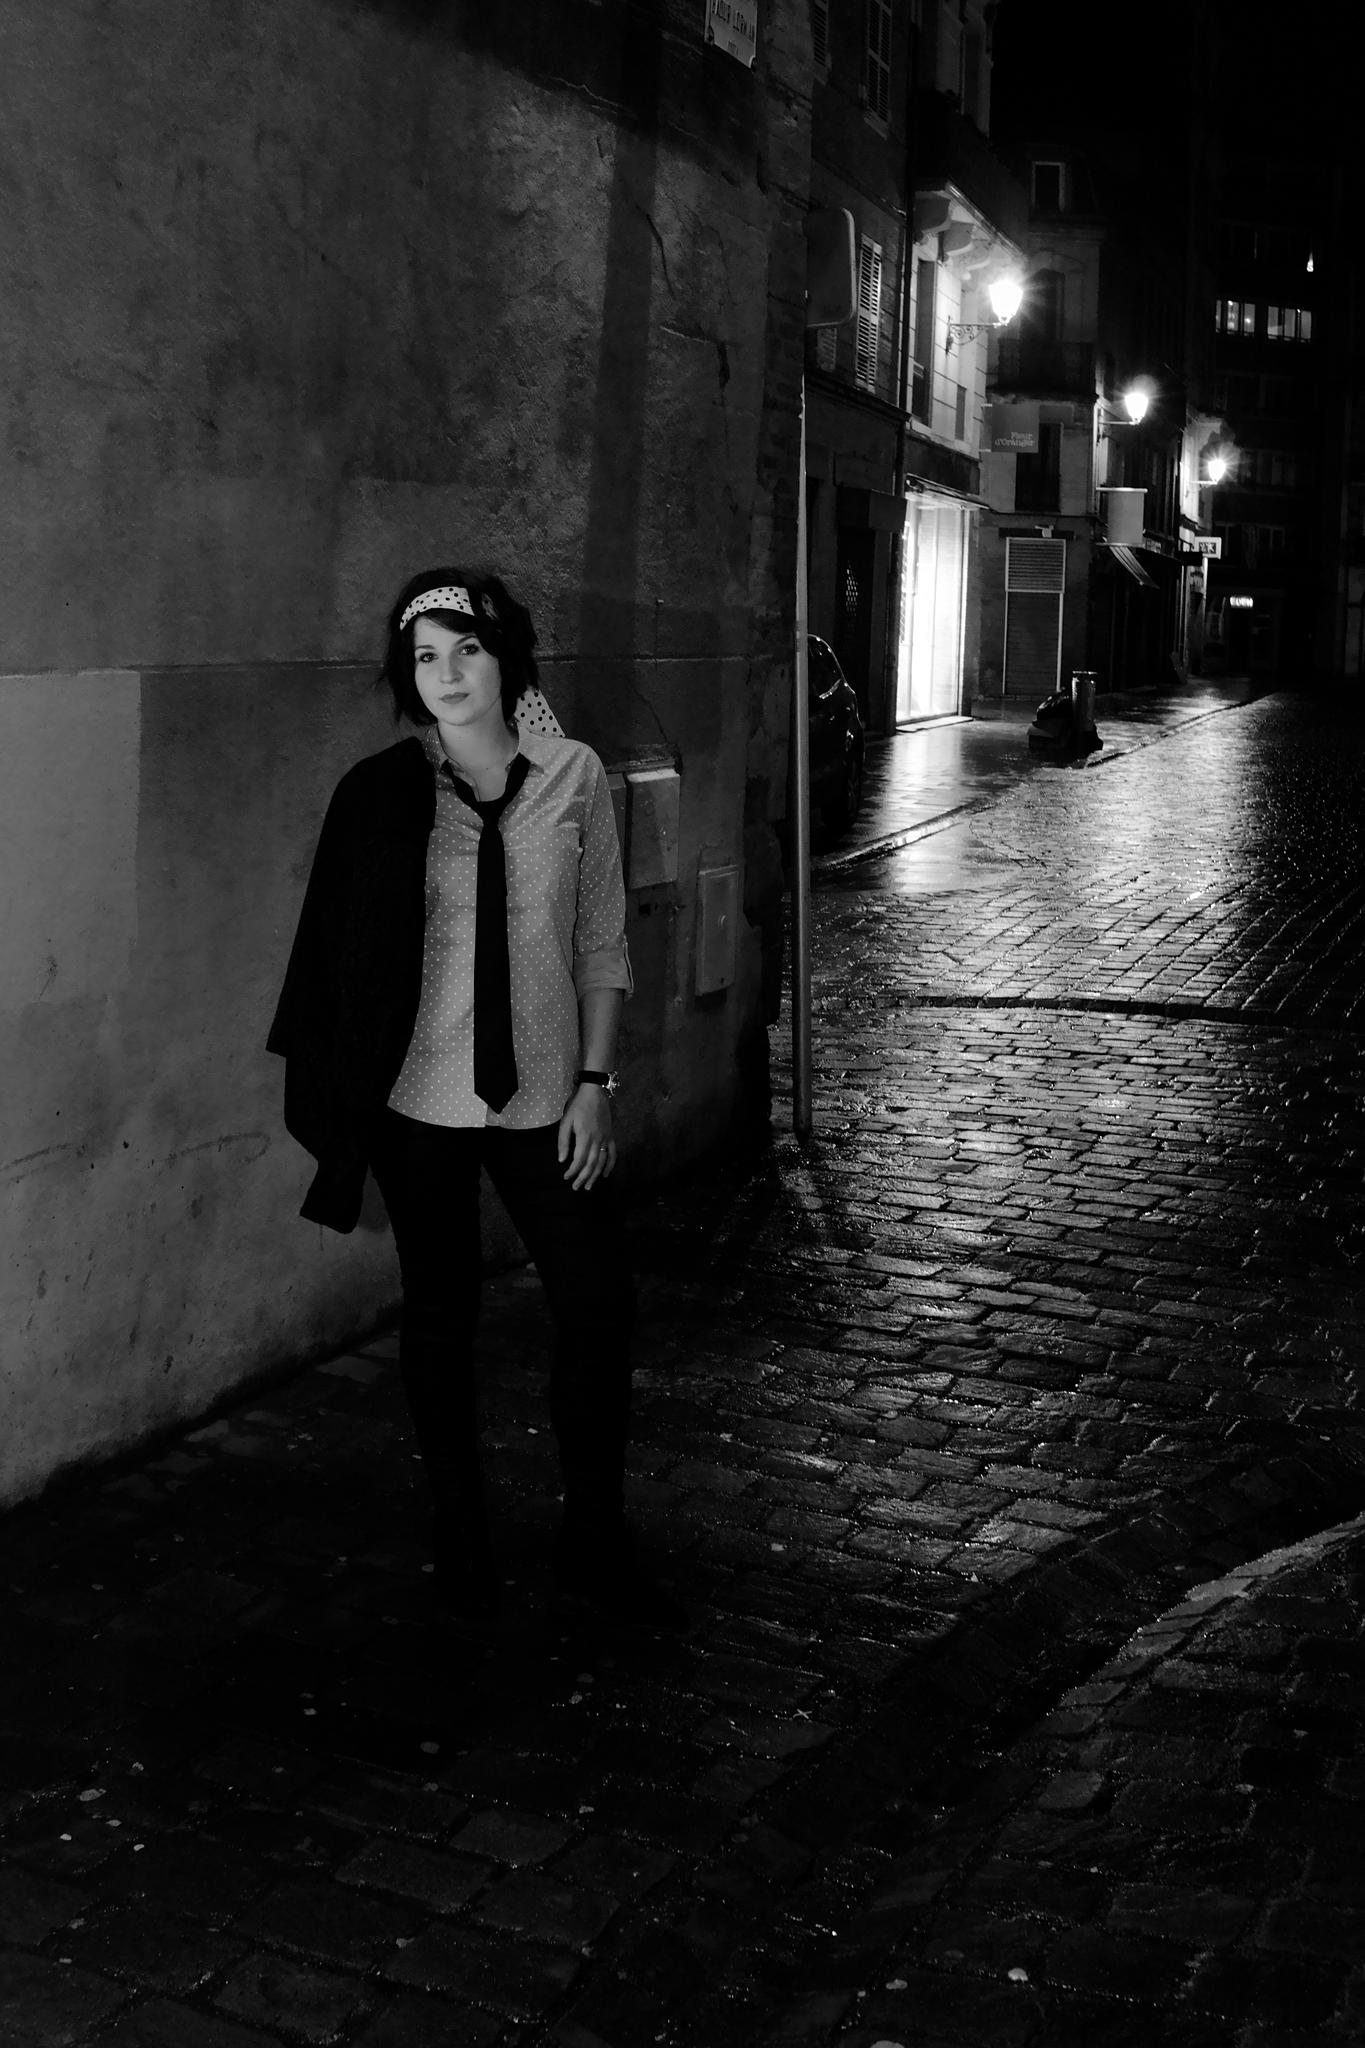 Night portrait by PhilippeMM